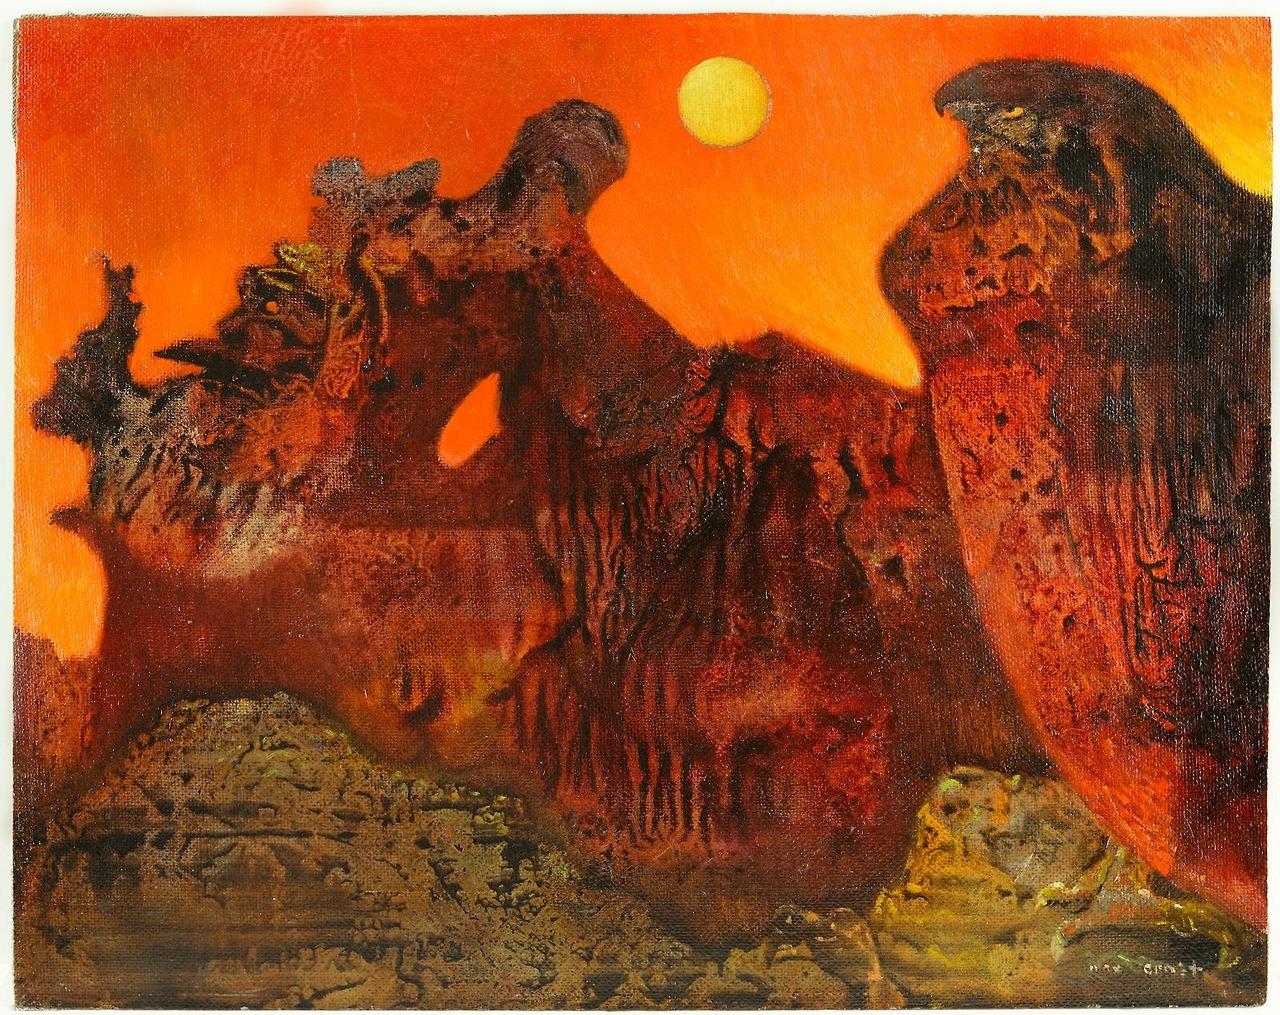 "thunderstruck9: ""Max Ernst (German, 1891-1976), Ohne titel (Sedona Landschaft) [Untitled (Sedona Landscape)], c.1957. Oil on masonite, 47.1 x 59.5 cm. """